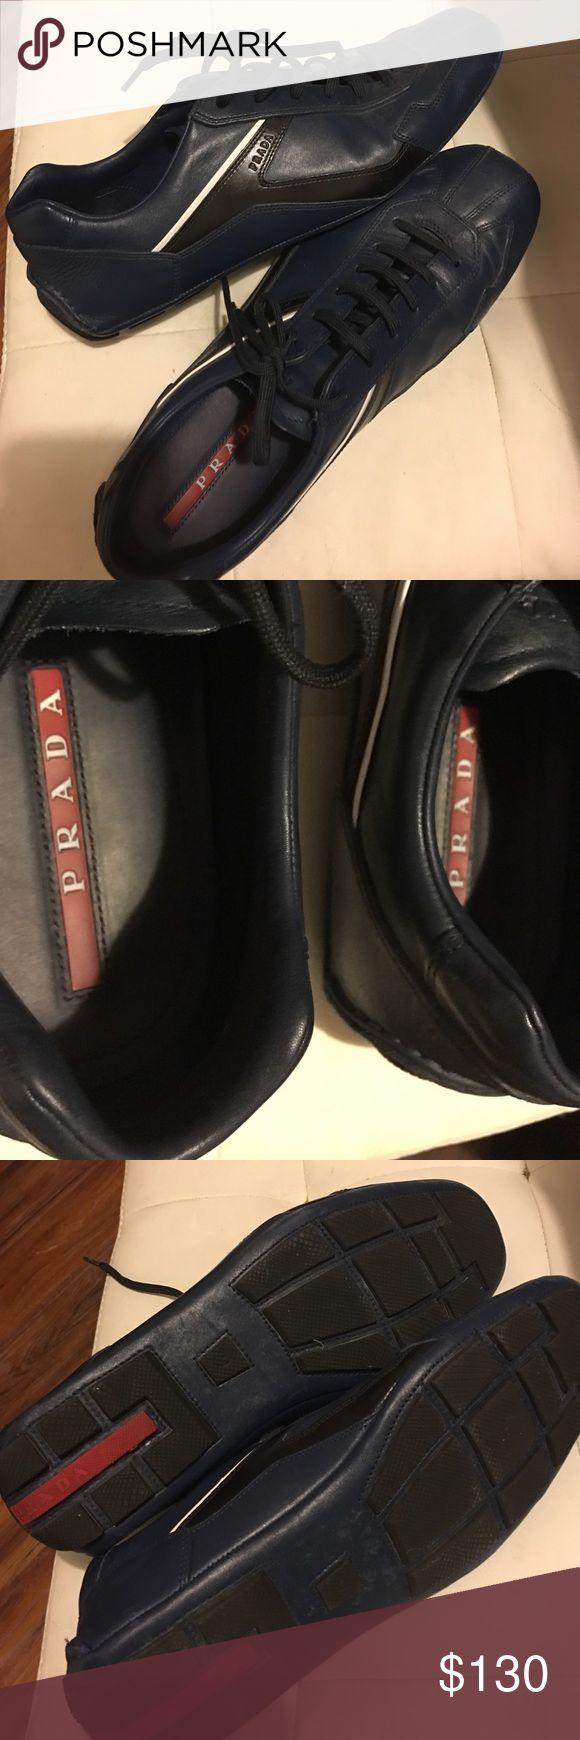 Men's Navy Prada Sneakers Prada/leather/Sport/ like new/perfect condition Prada Shoes